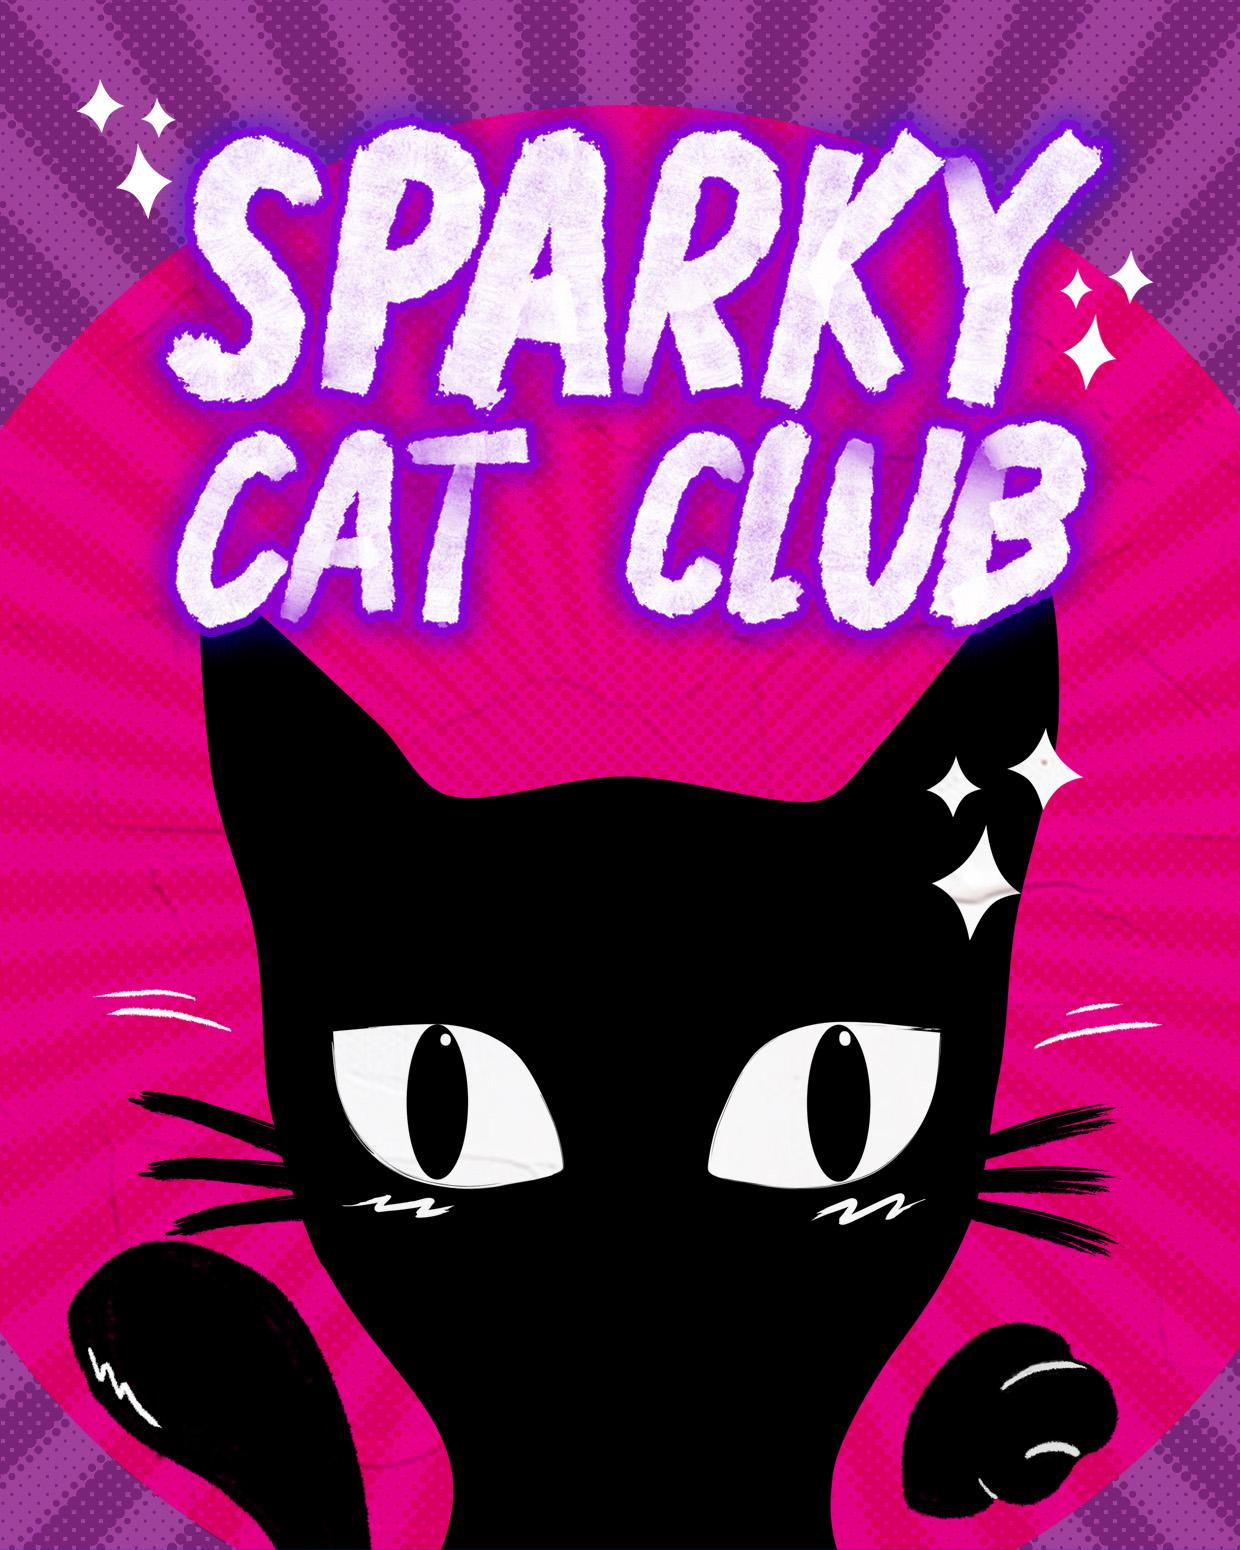 Sparky Cat Club